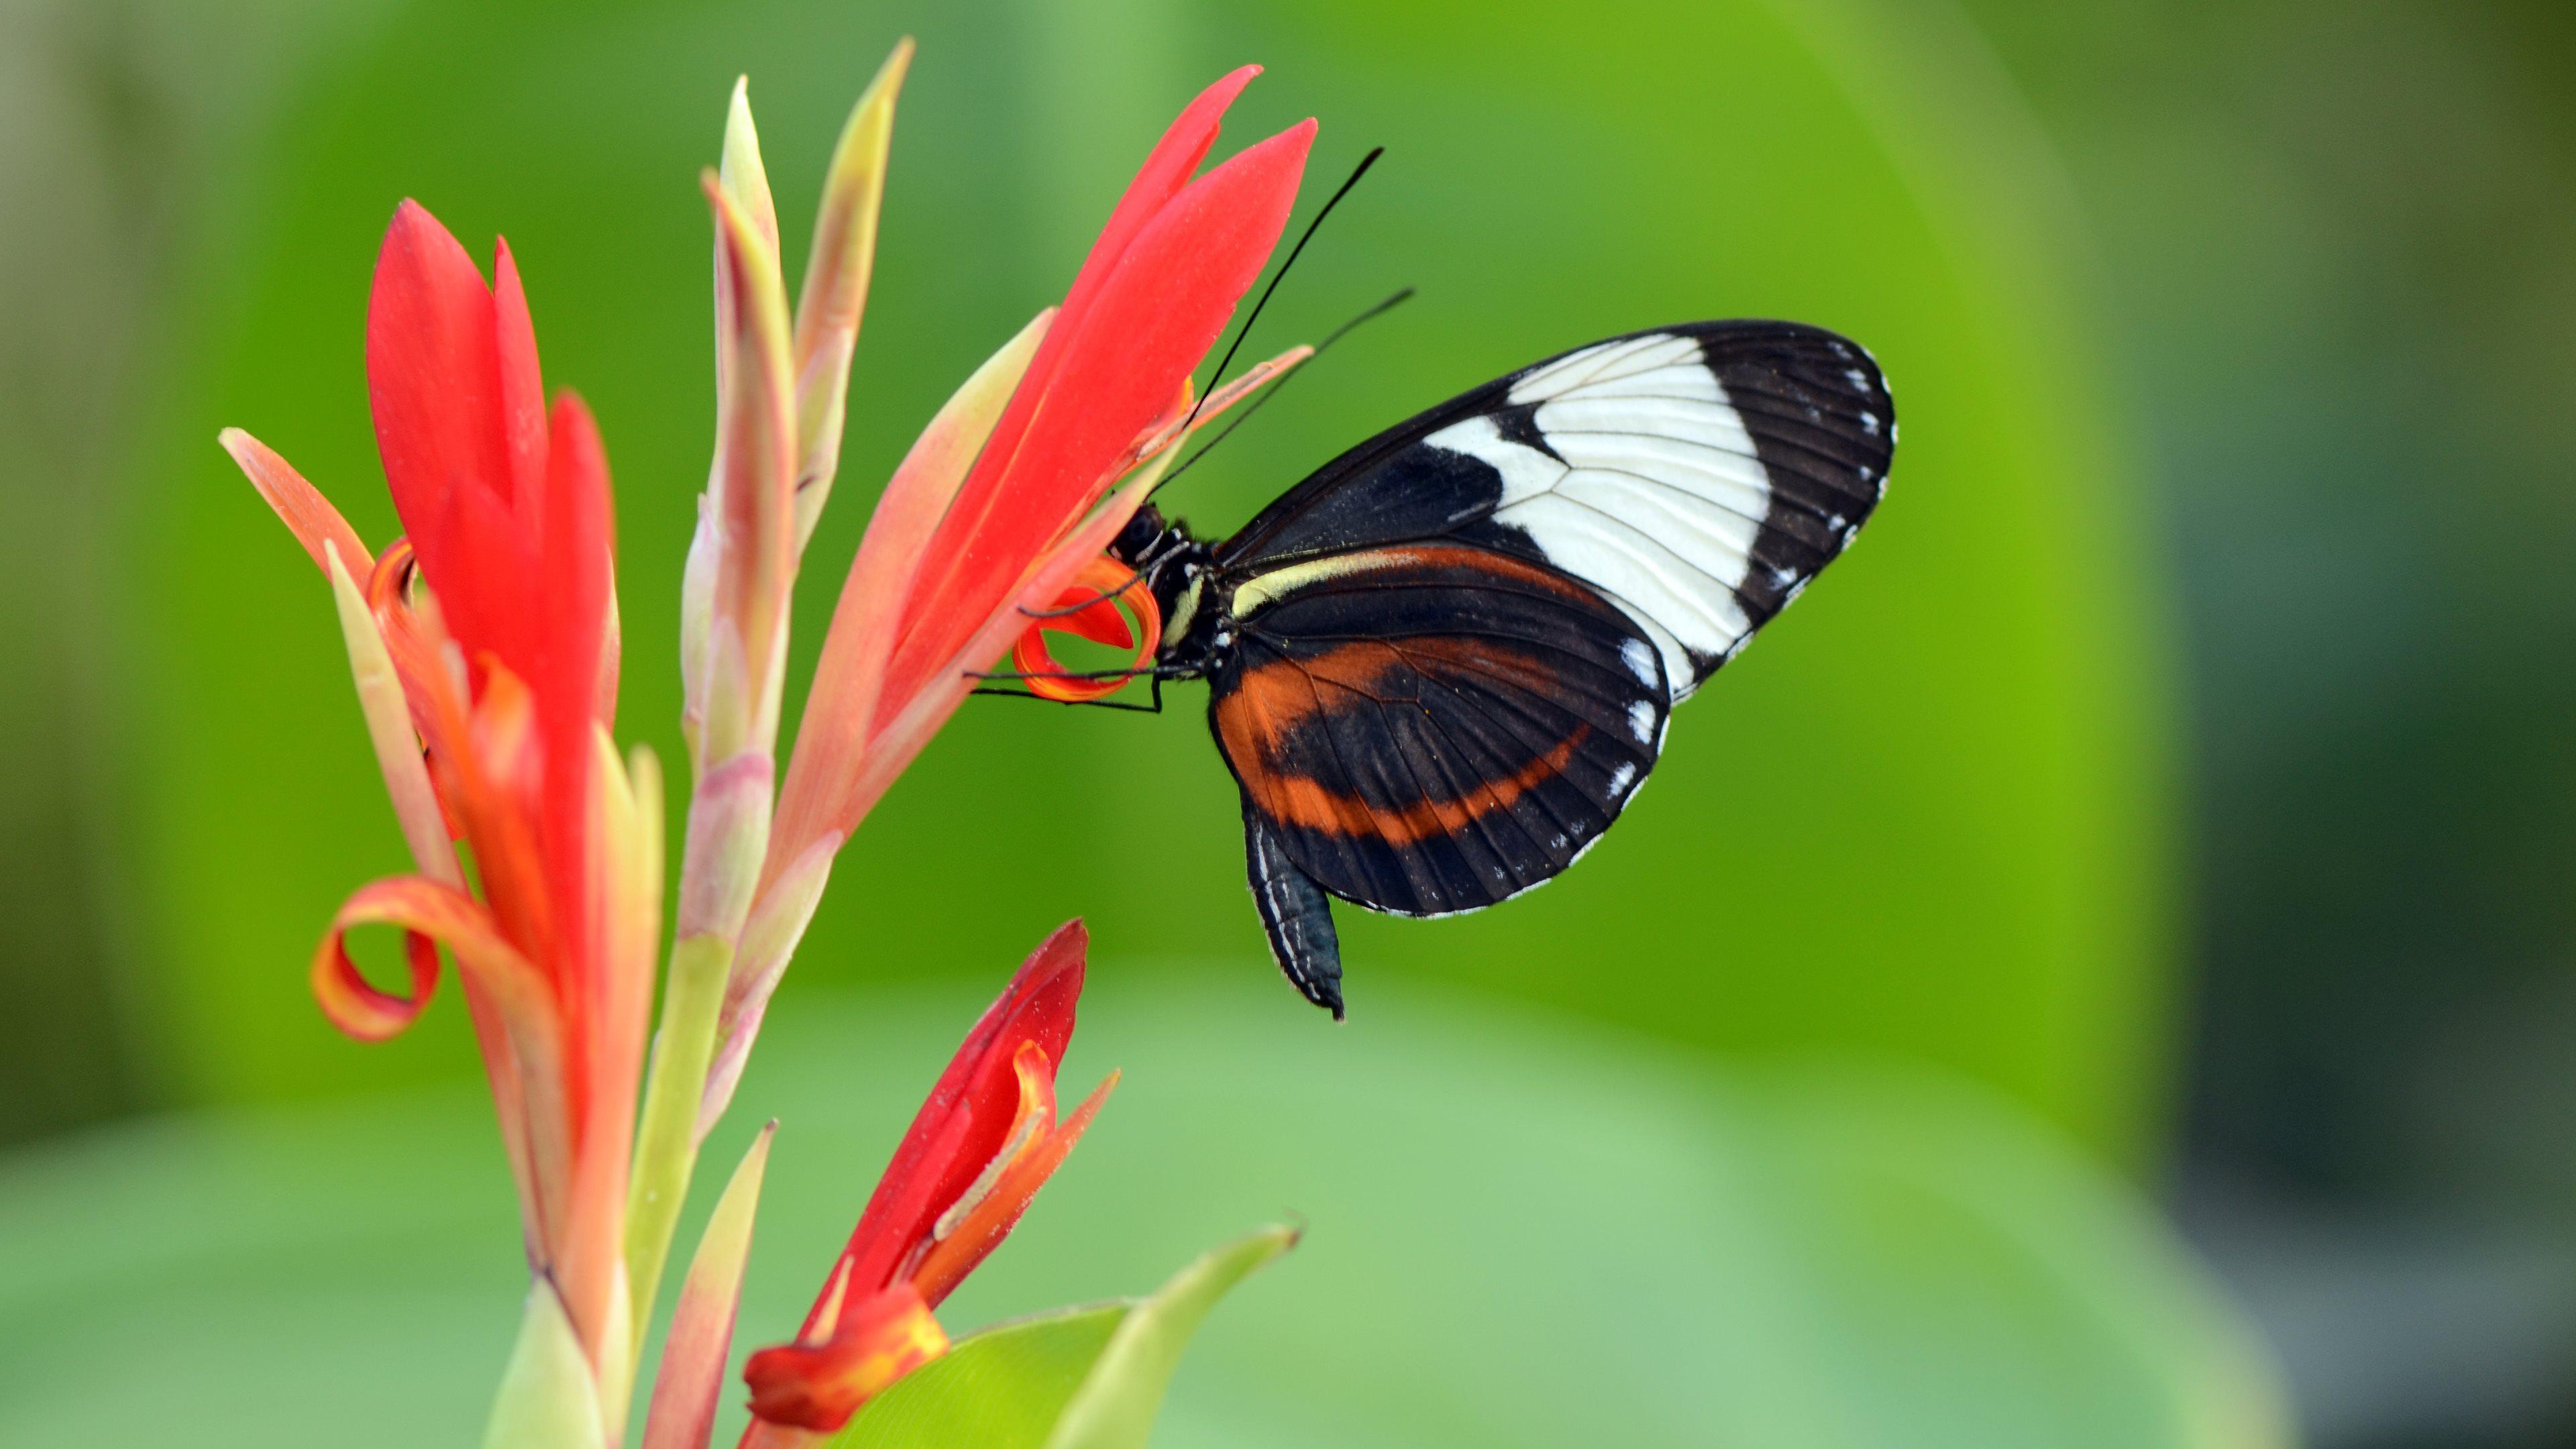 butterflies 4k Ultra HD Wallpaper and Background Image ...